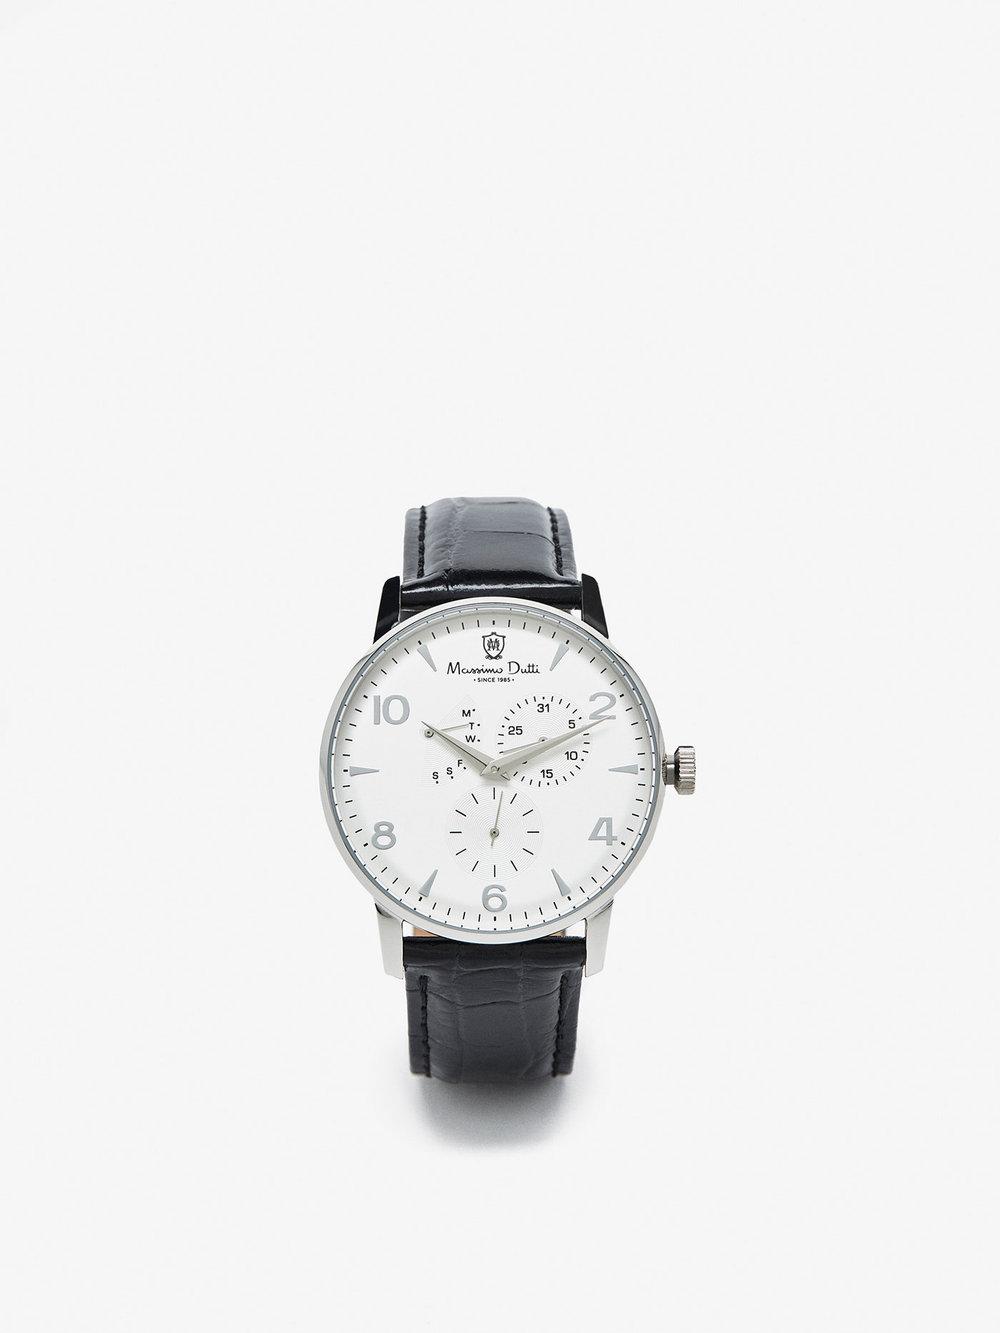 Relógio Meticulous, Massimo Dutti